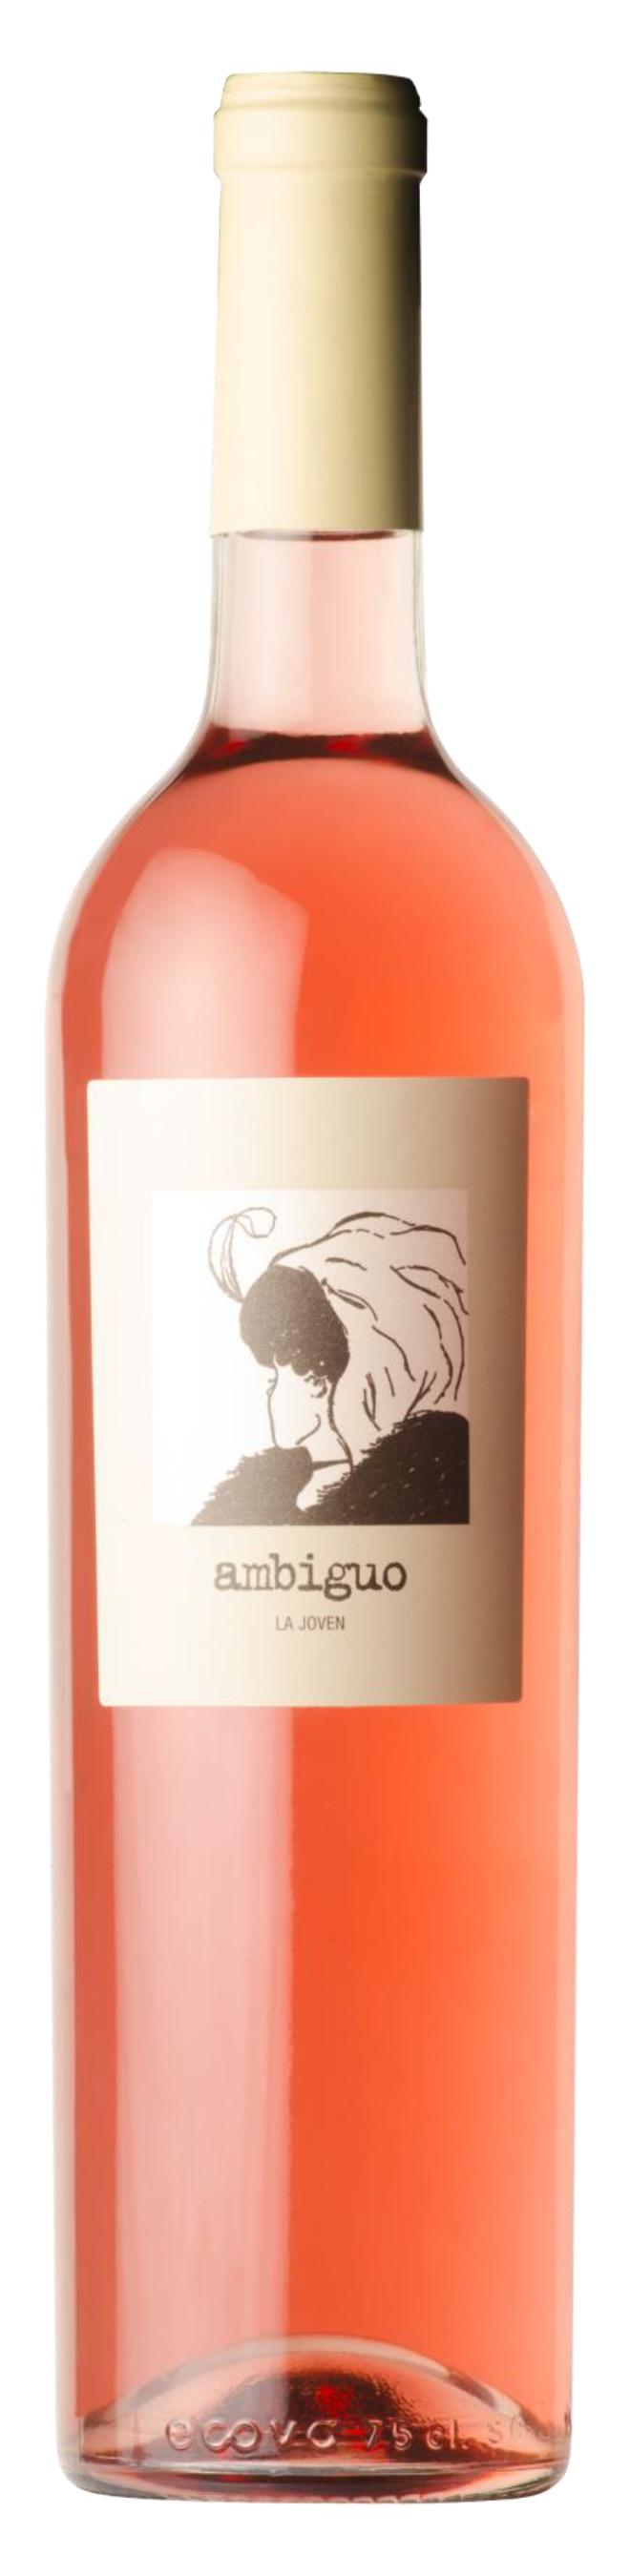 MAAL Ambiguo Bottle (Pink color).jpg